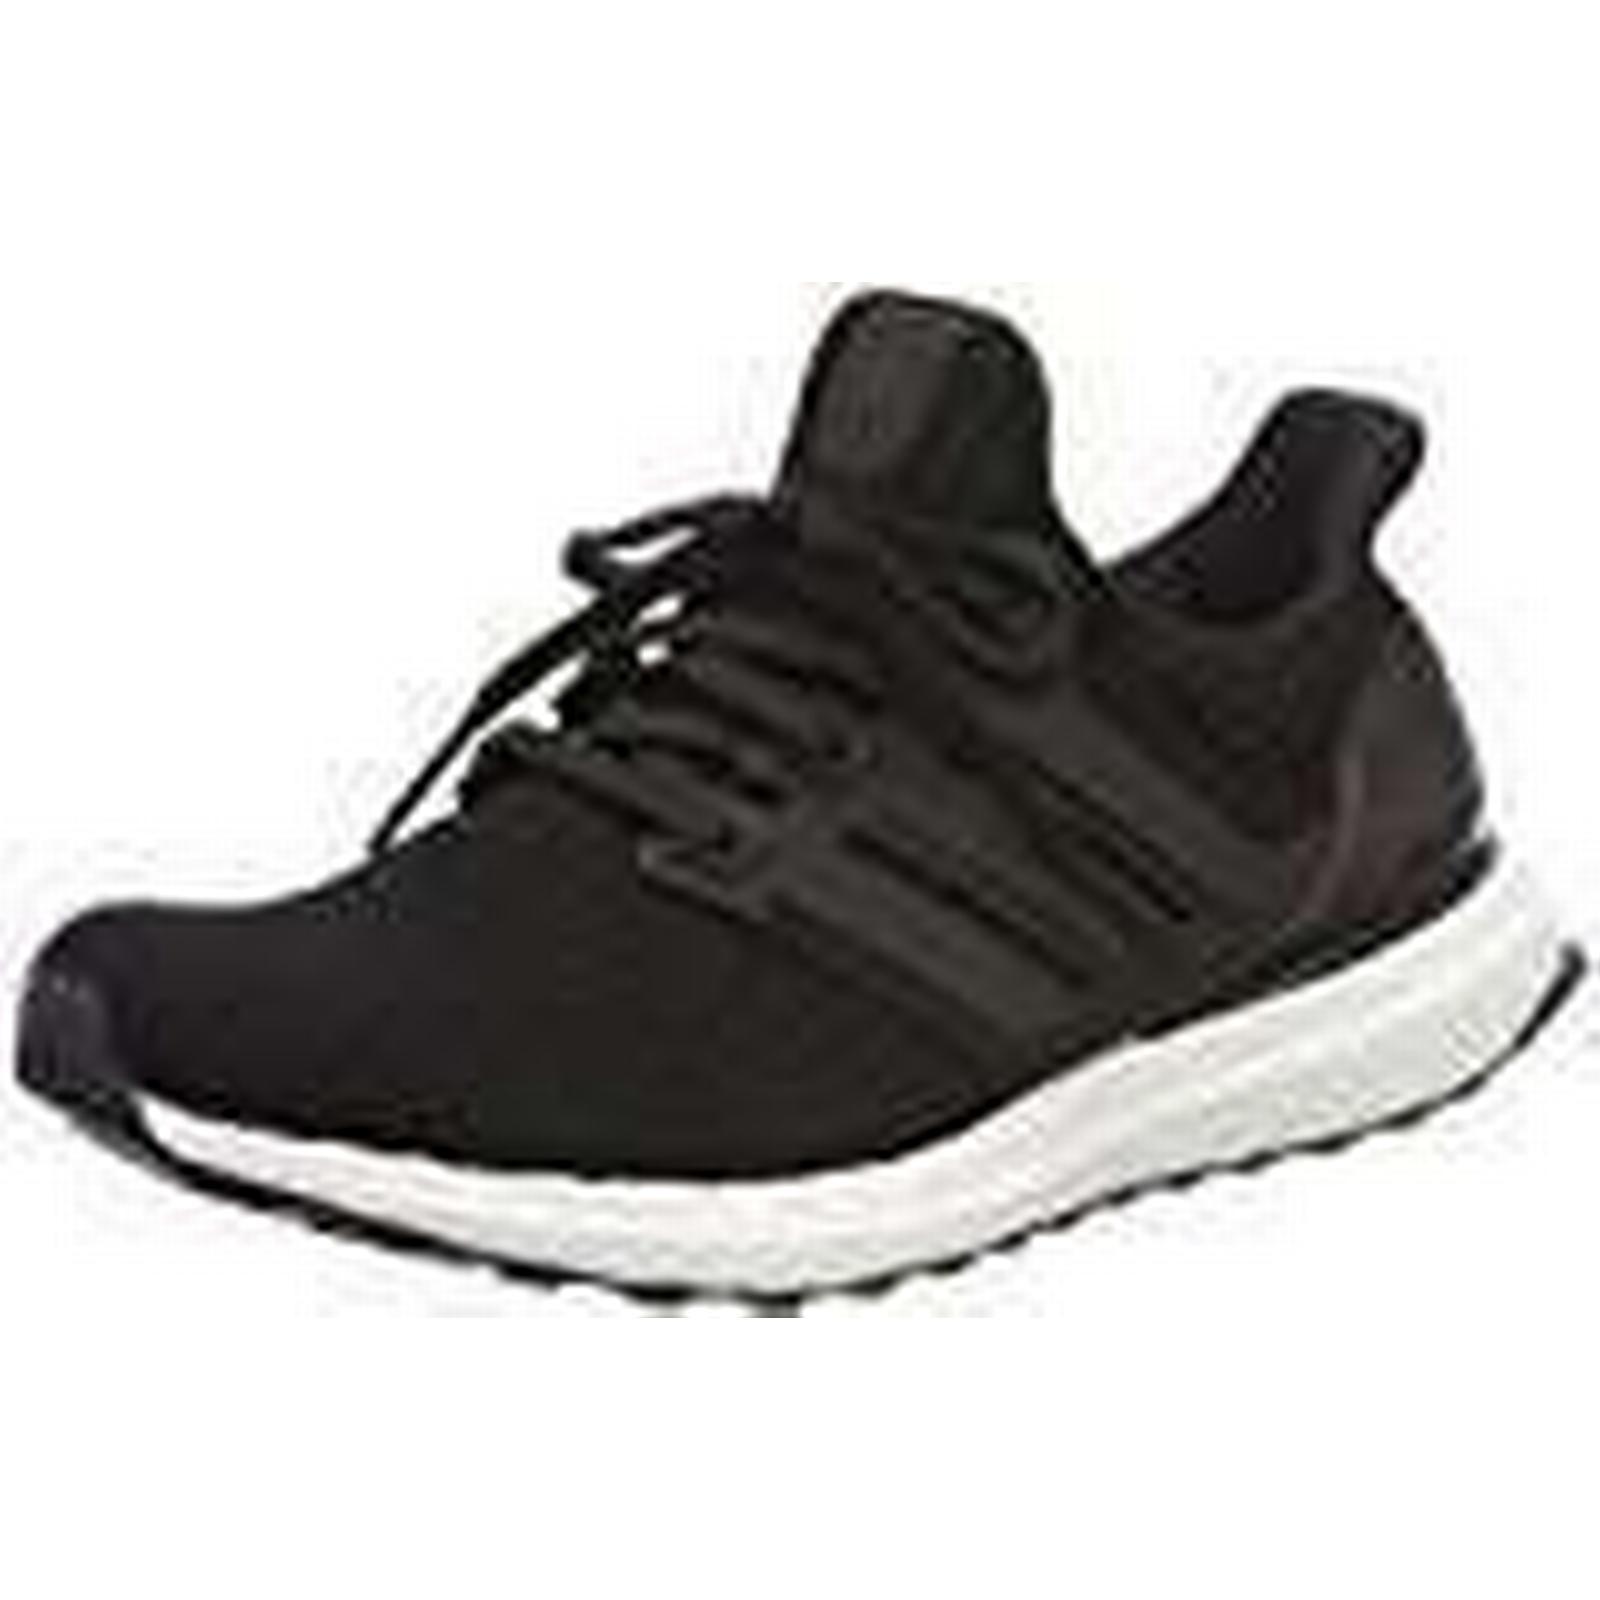 Adidas Women''s Core Ultraboost W Running Shoes, Core Women''s Black, 9.5 UK b8330c